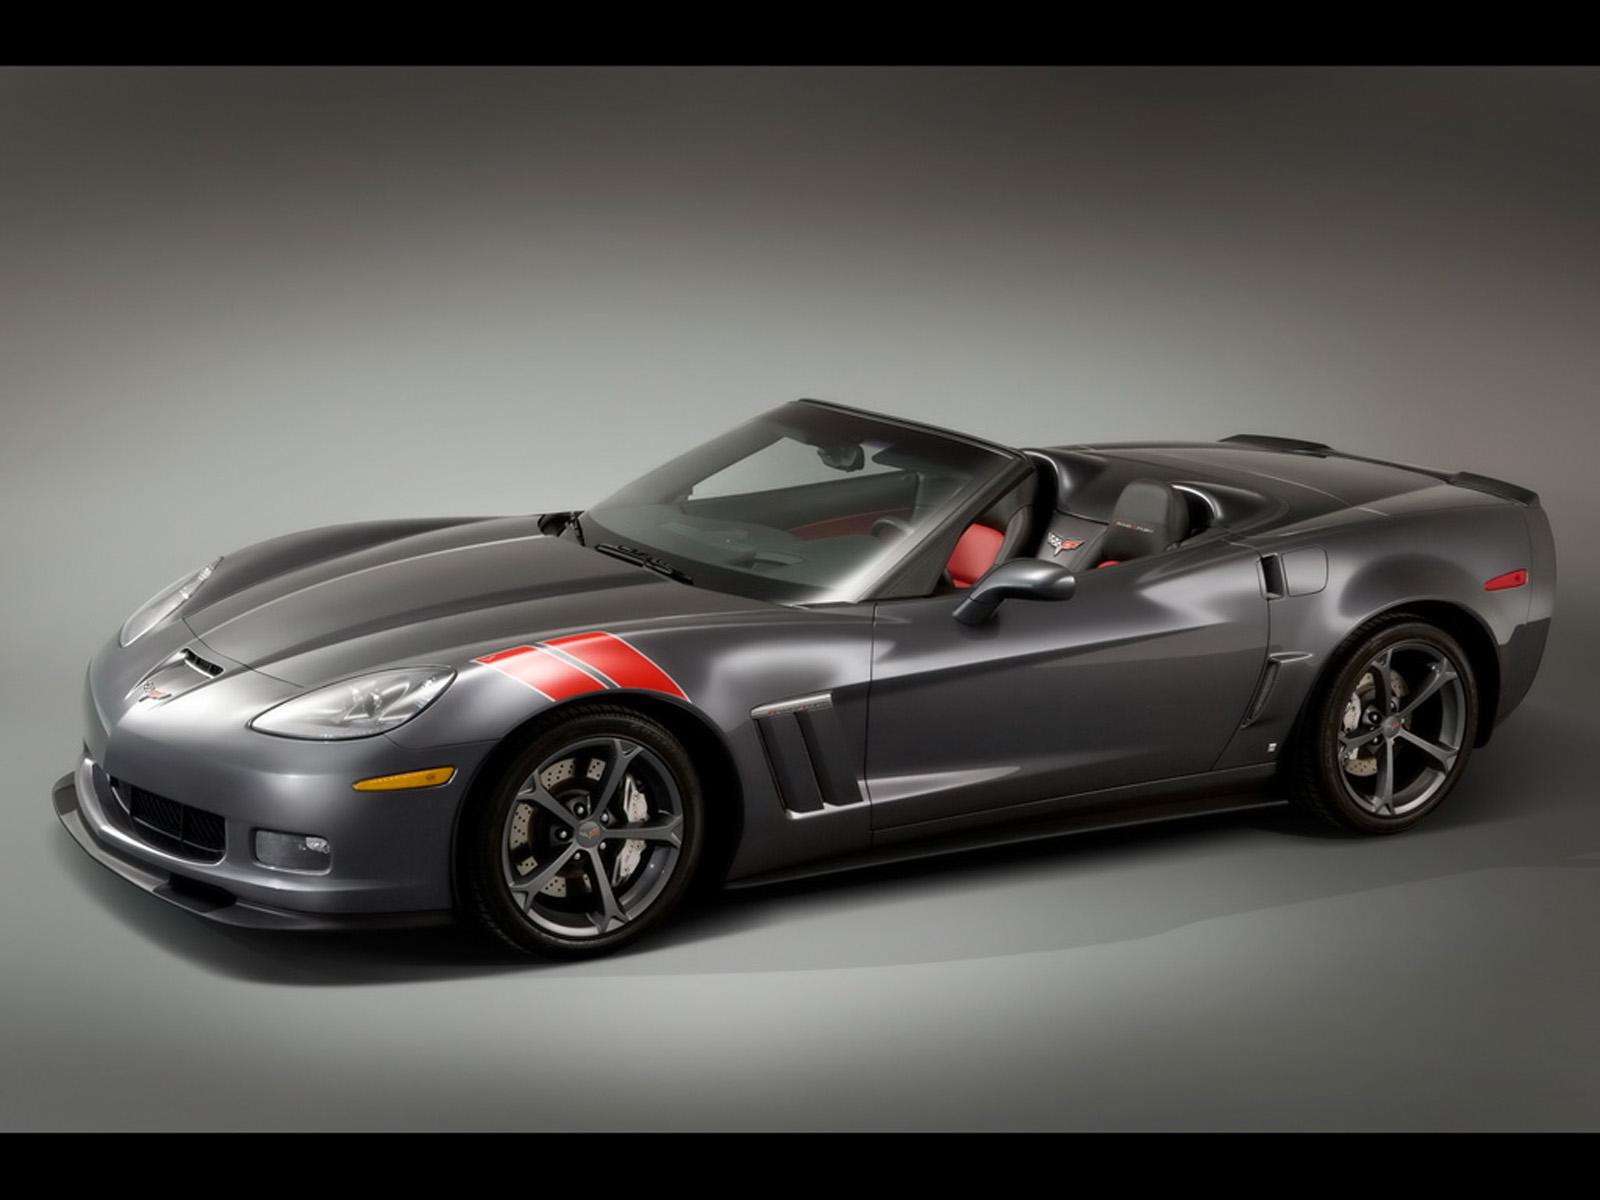 http://4.bp.blogspot.com/-yaHSAVNFdFA/T0neY-6cJnI/AAAAAAAAAbg/Ga6Lu491EJo/s1600/Chevy+Corvette+ZR1+Cars+Wallpapers+3.jpg